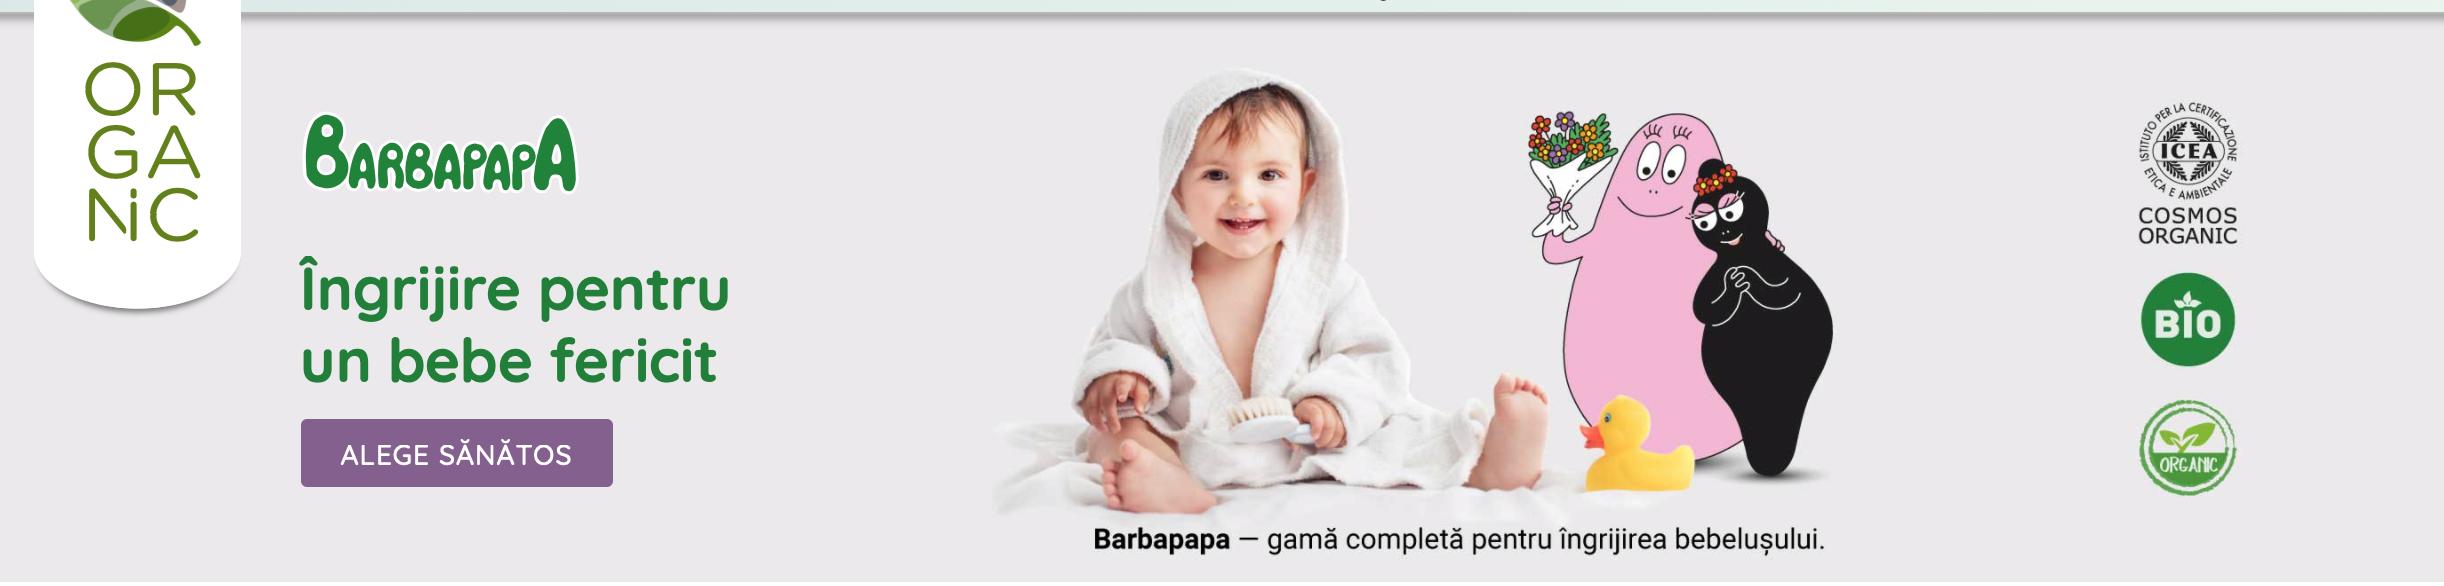 produse barbapapa